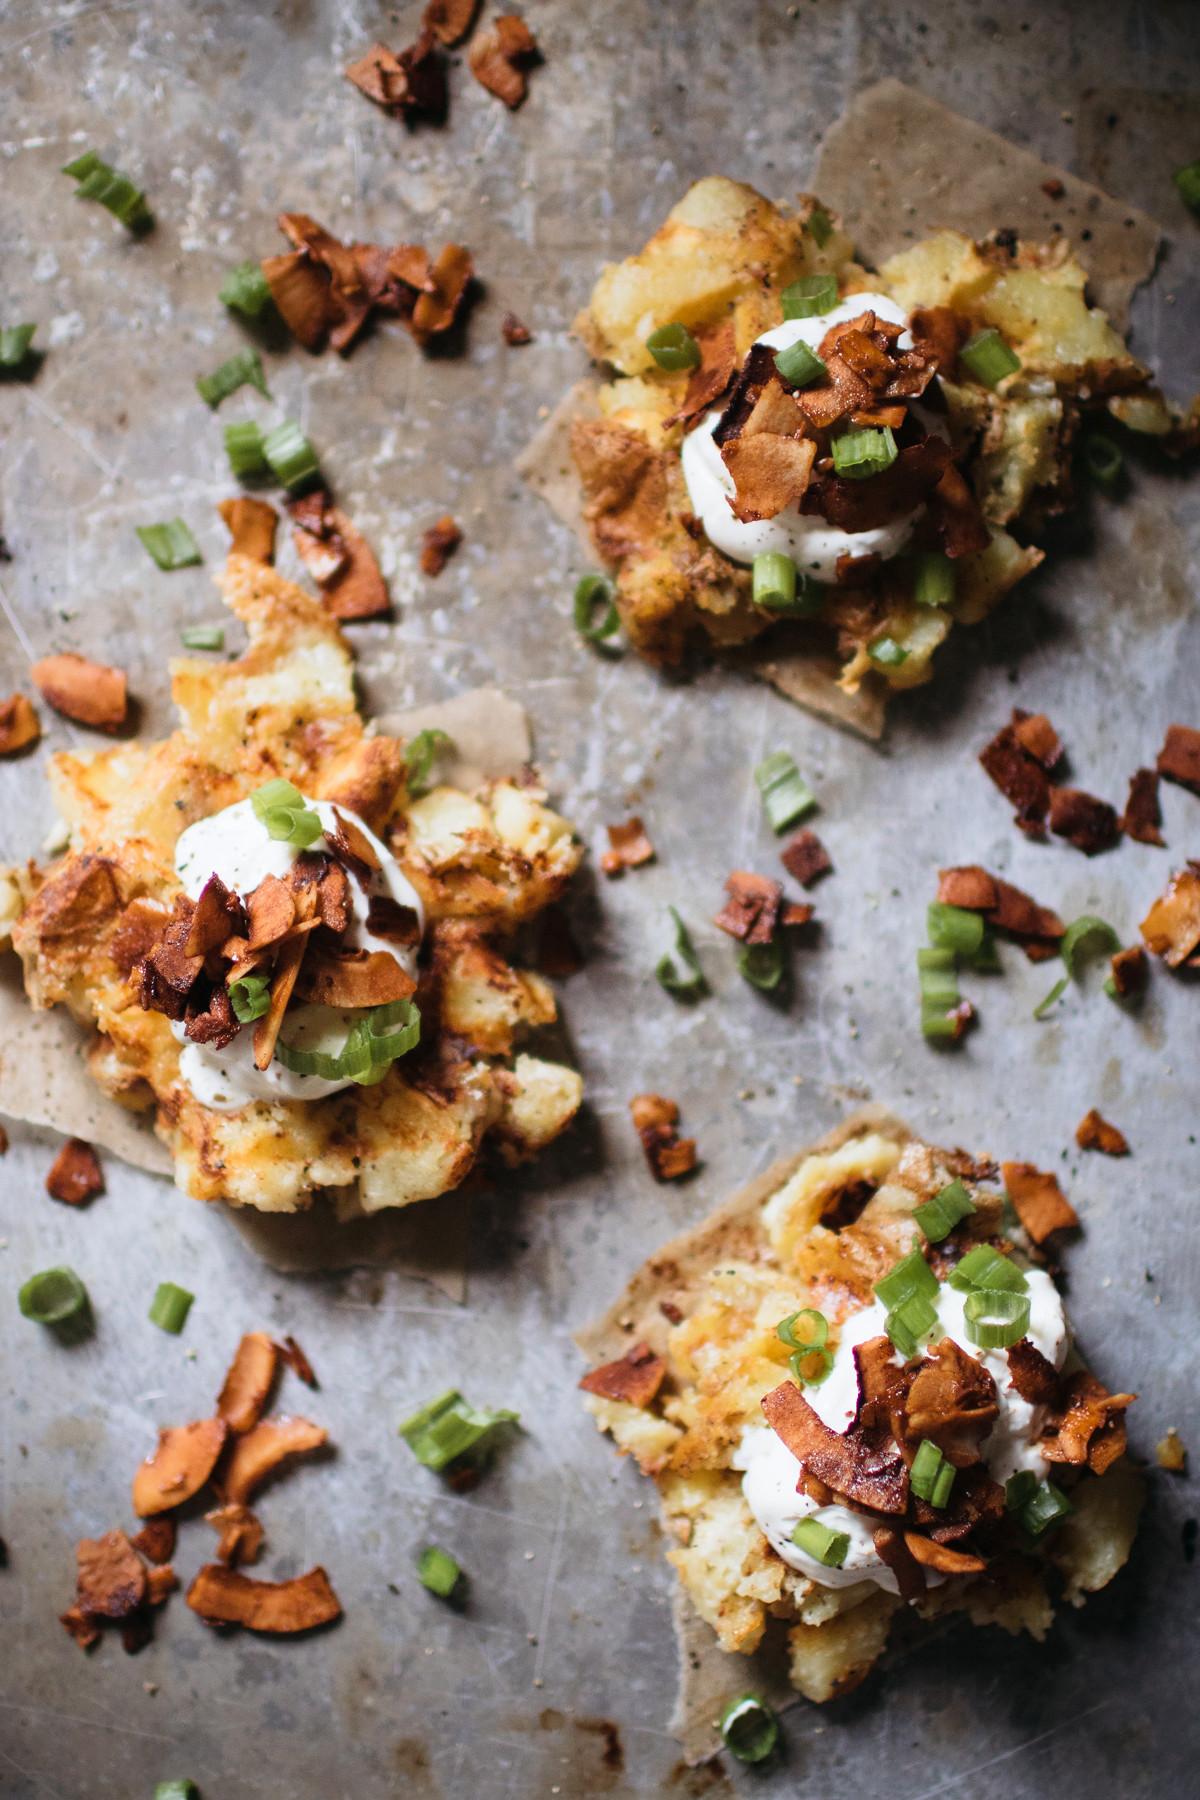 Vegetarian Waffles Recipe  savory waffles ve arian